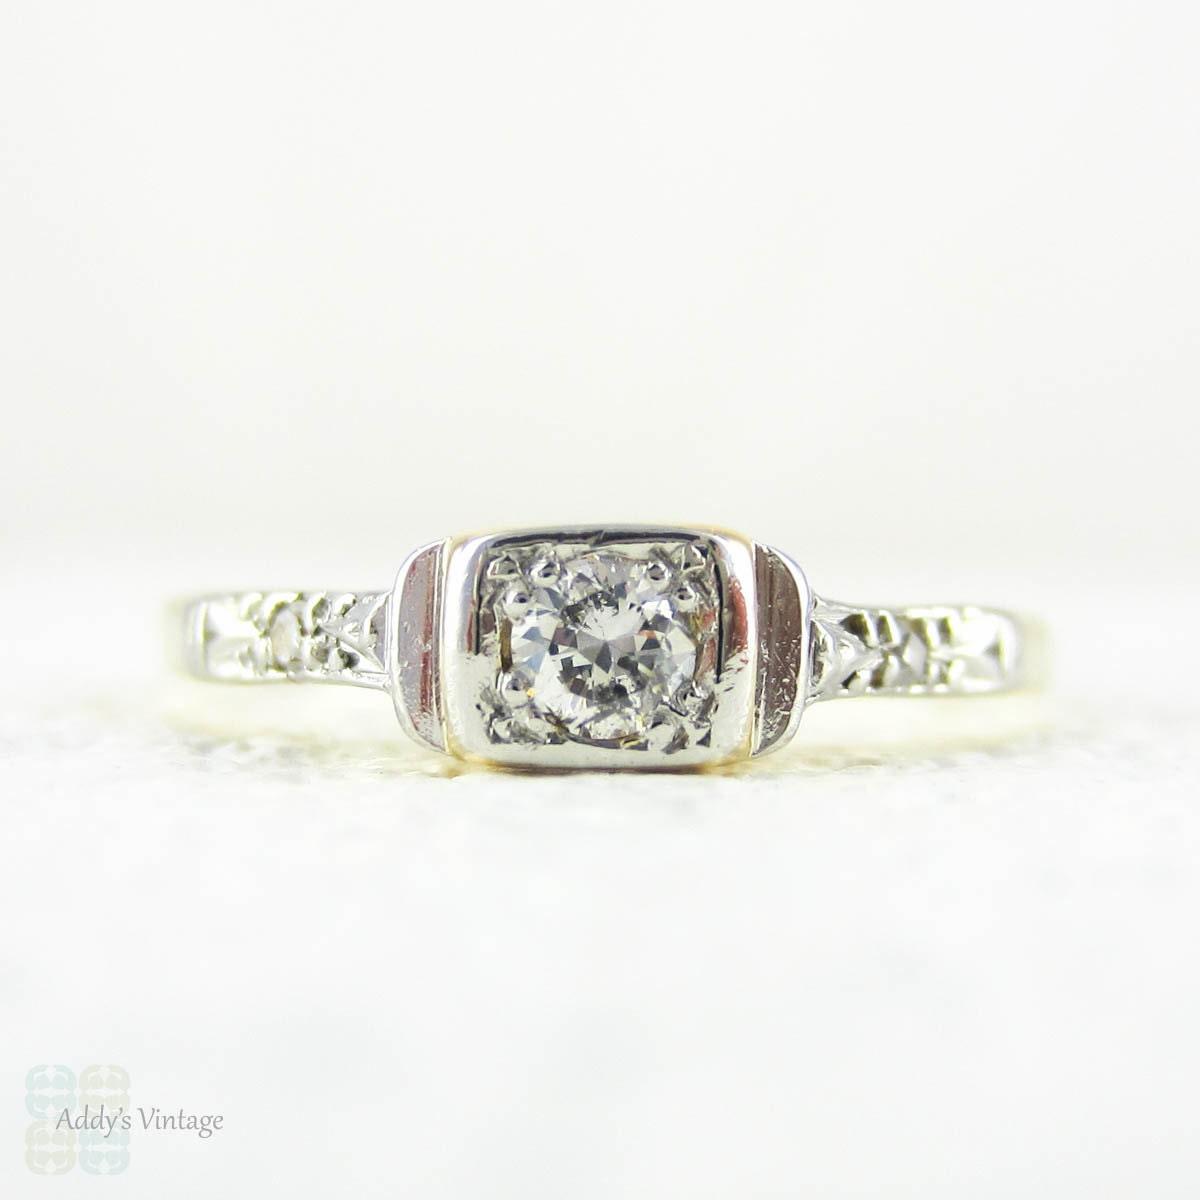 Dainty Diamond Engagement Ring Three Stone Diamond Ring in